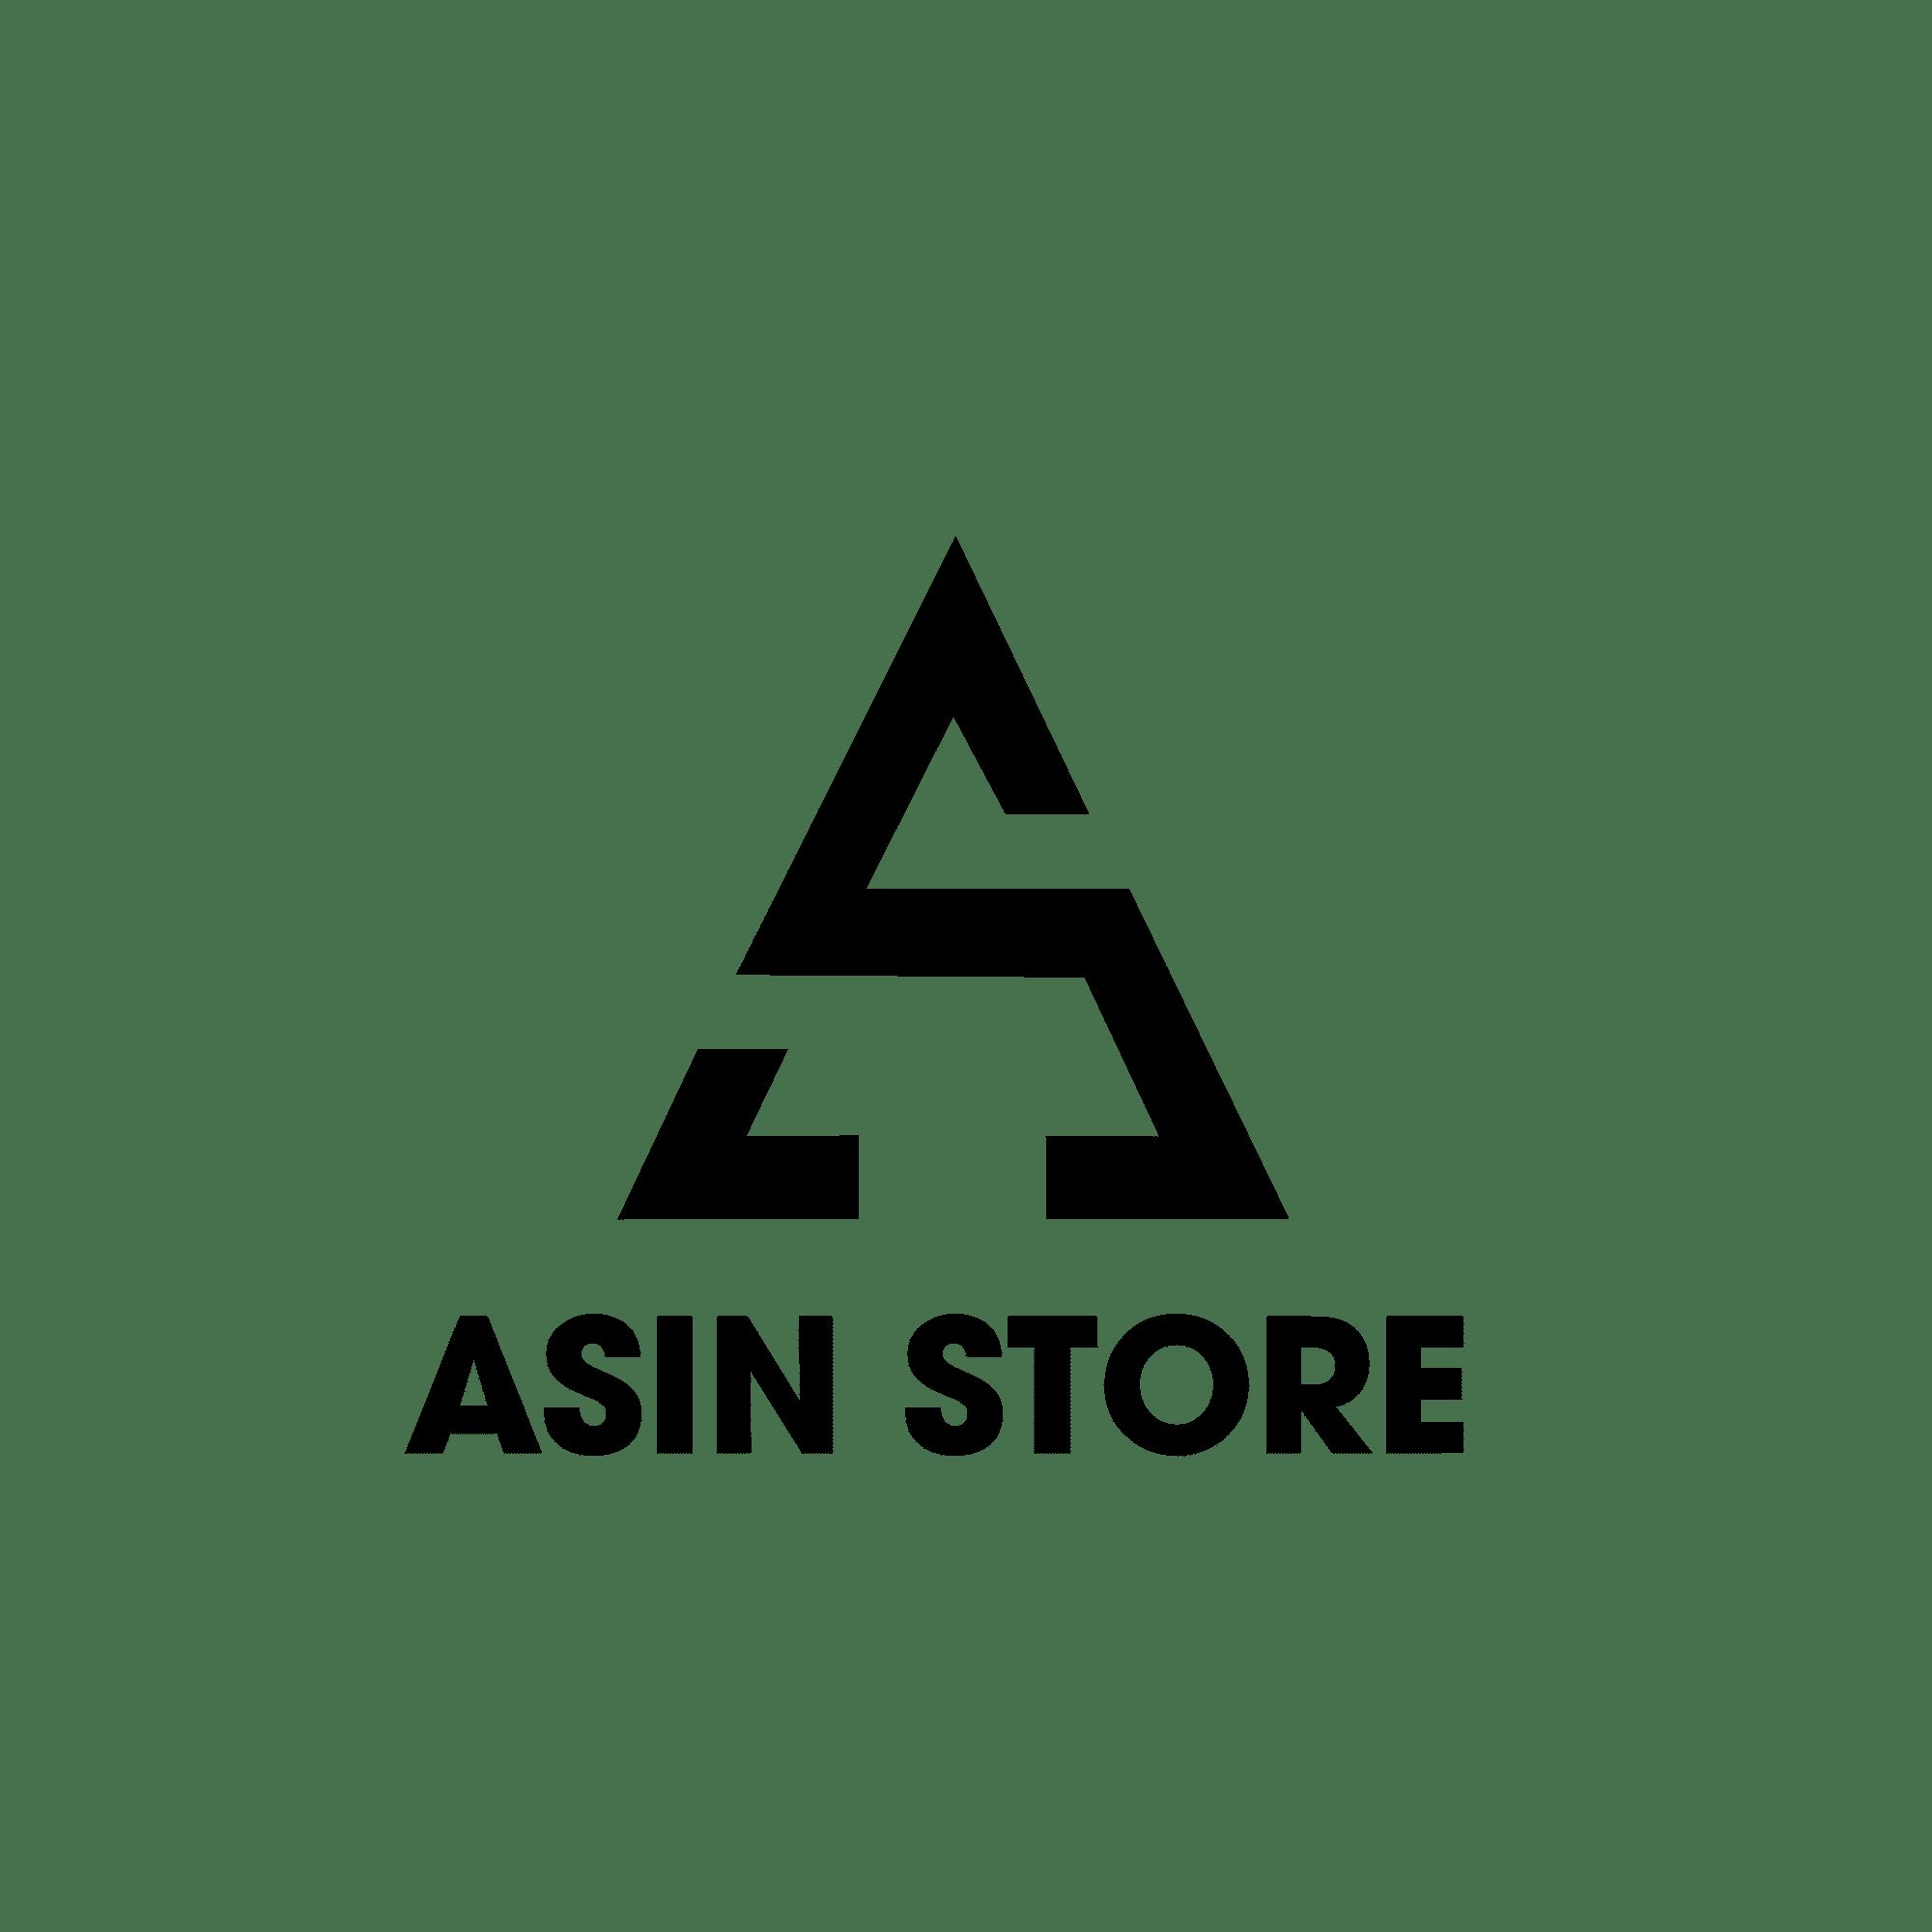 Logo shop quần áo Asin Store